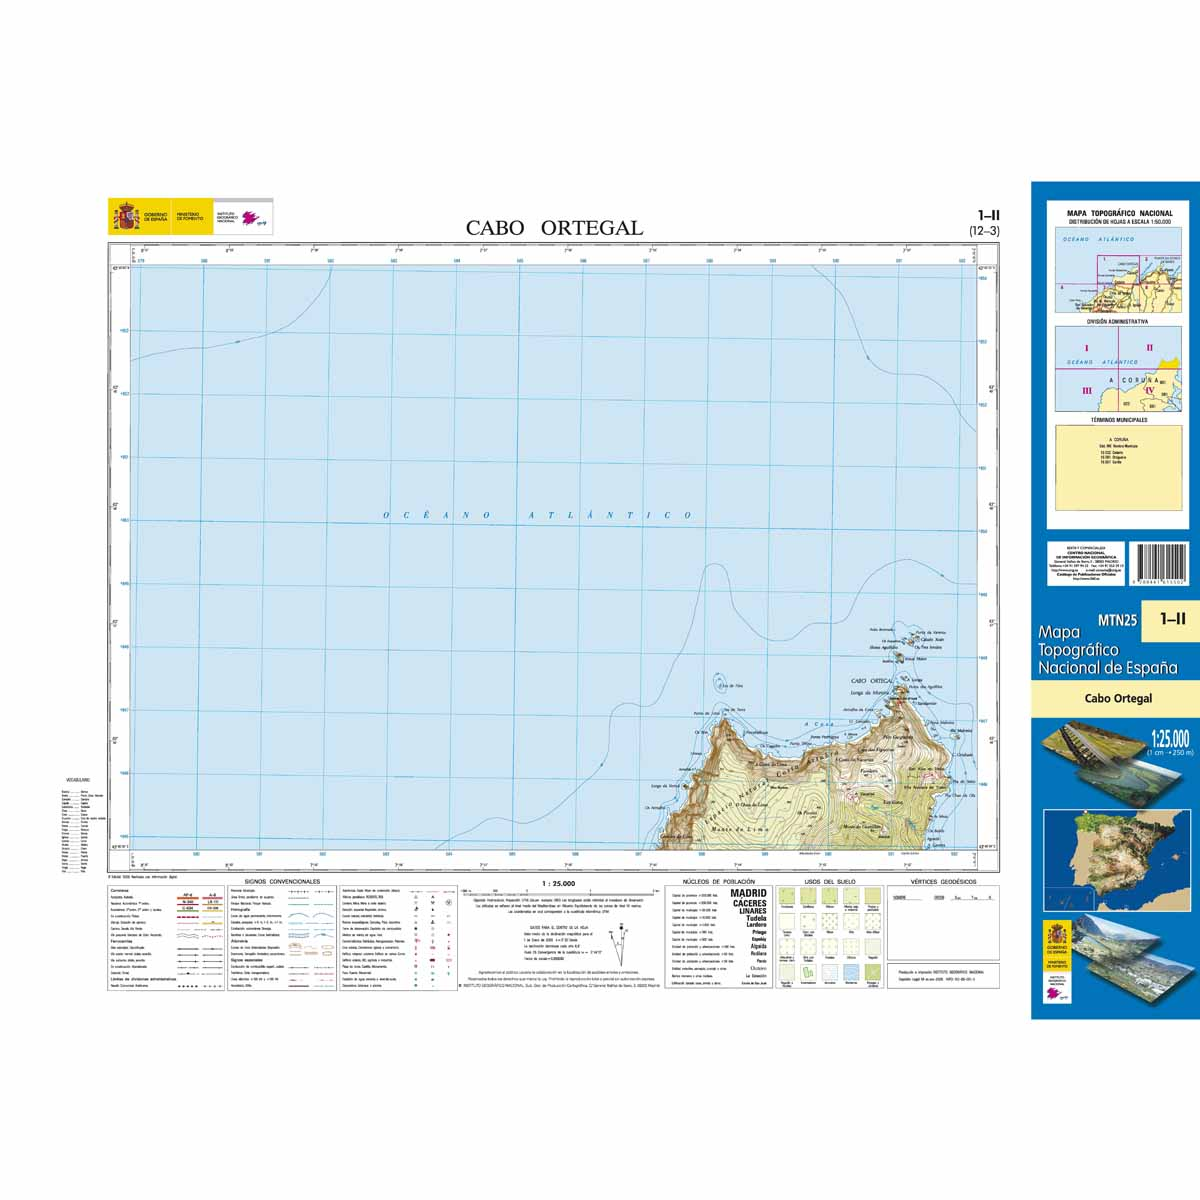 Cabo Ortegal Mapa Fisico.Galicia Relieve 1 250 000 Ed 2014